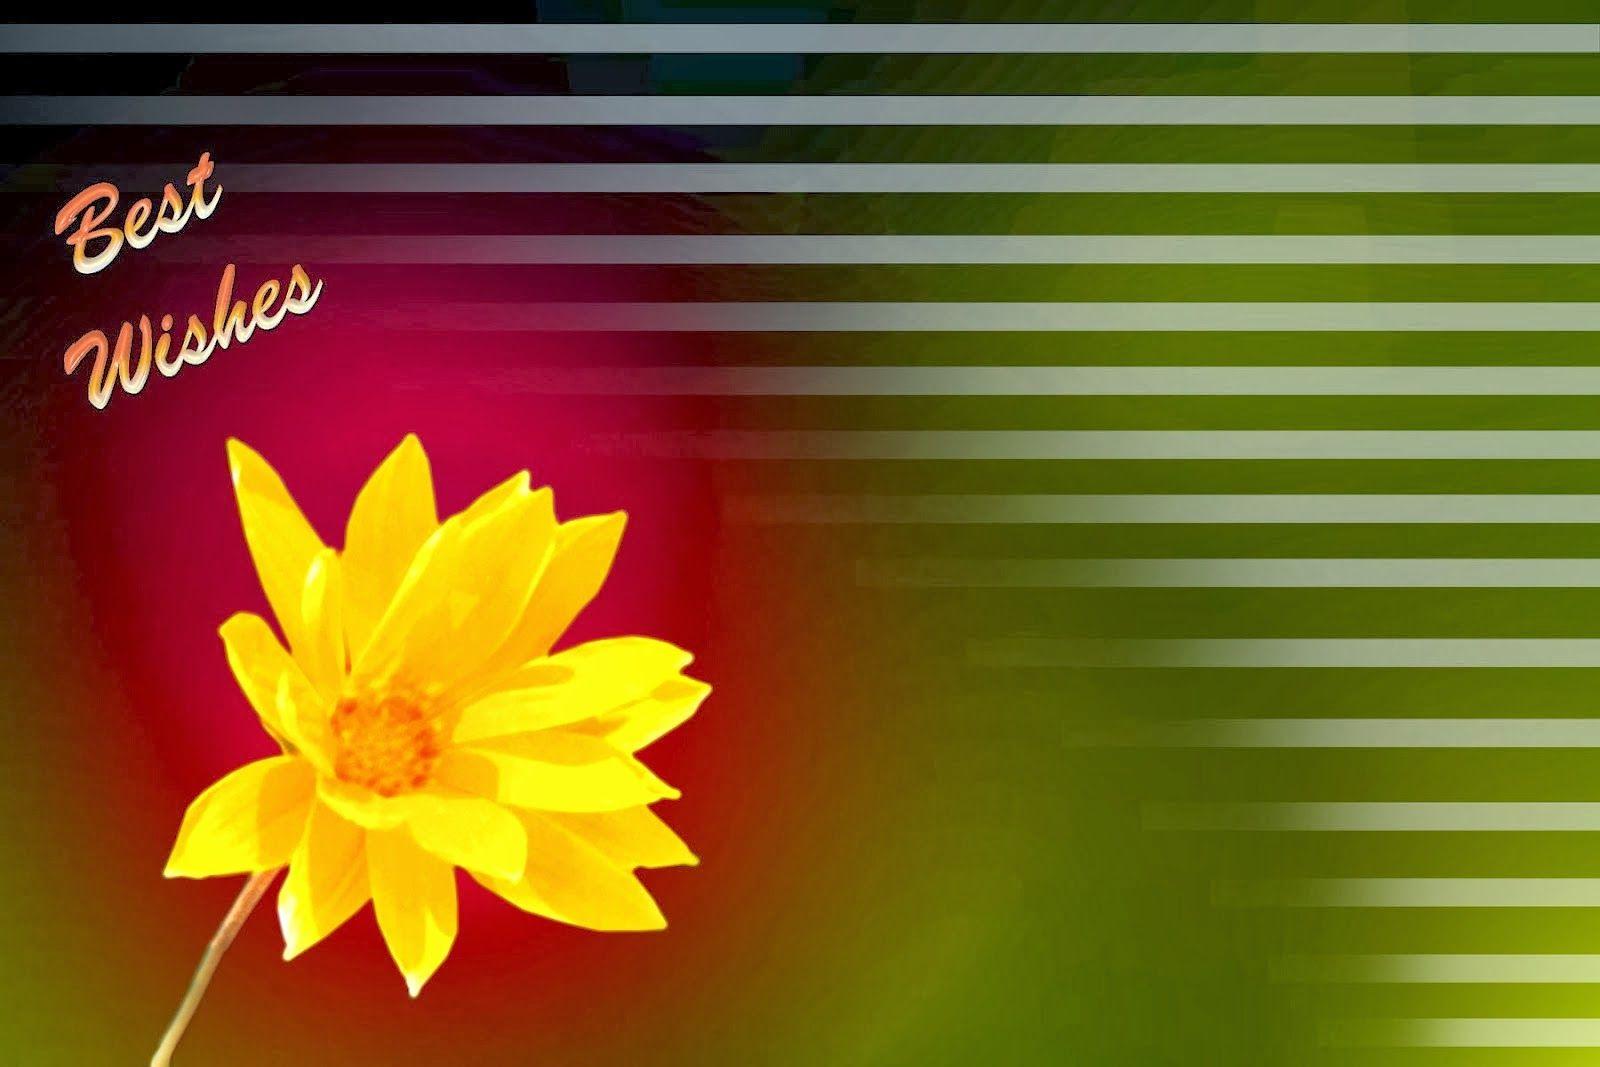 freephotoshop backgroundshighresolution wallpapers